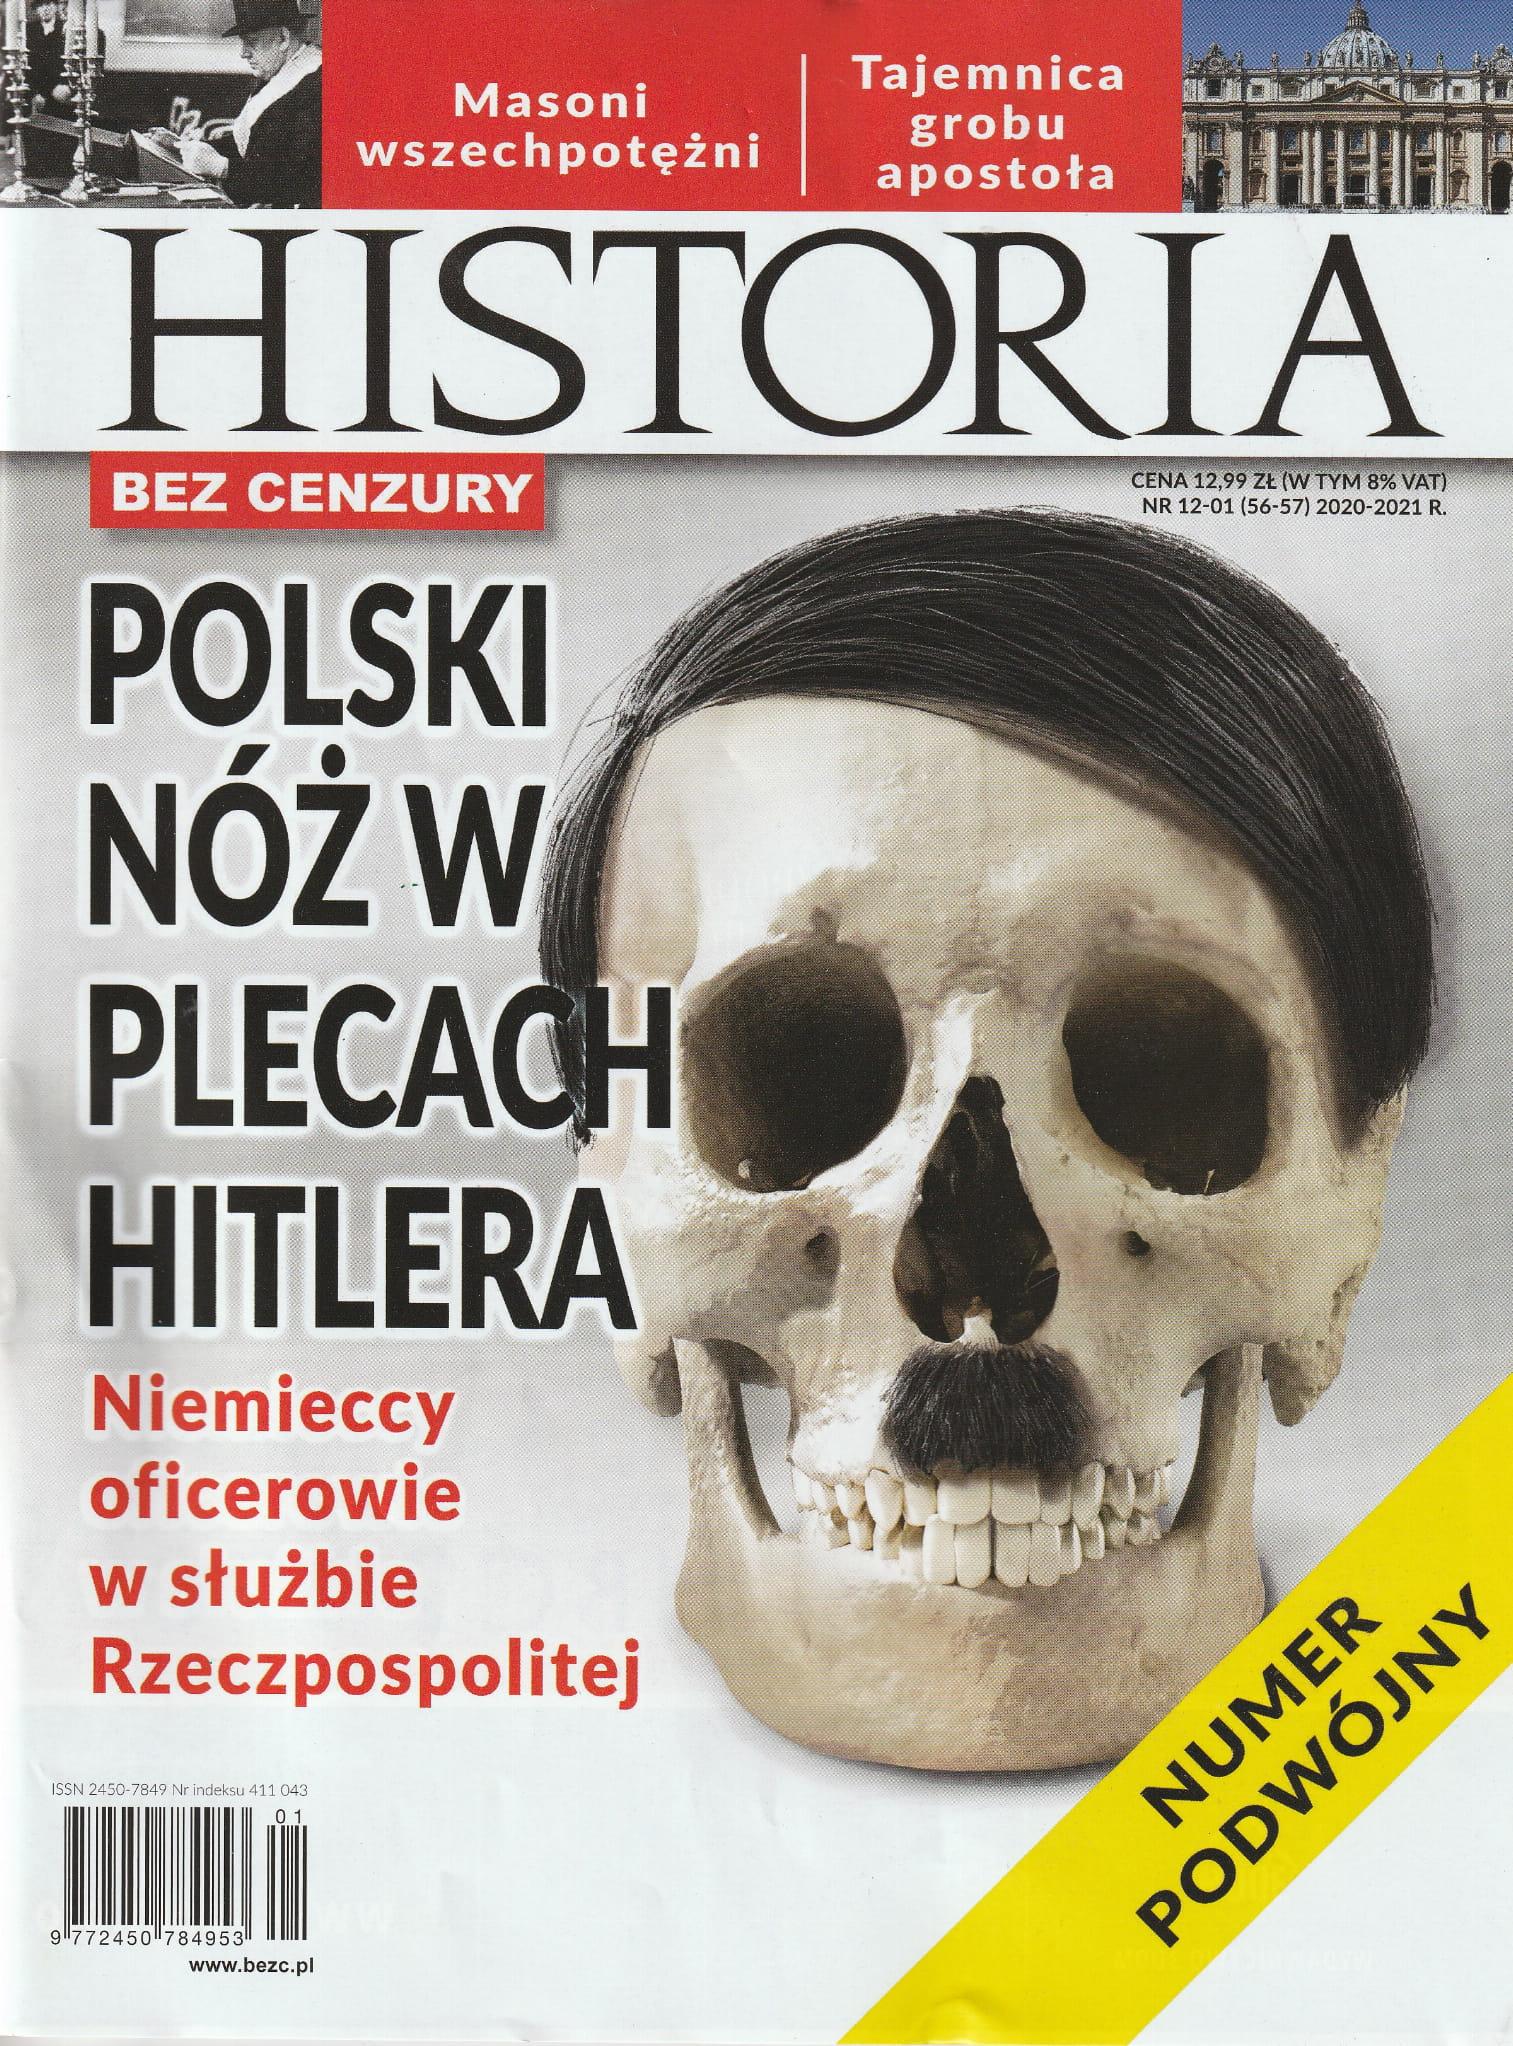 Historia bez cenzury nr 12-01 (56-57) 2020 r.